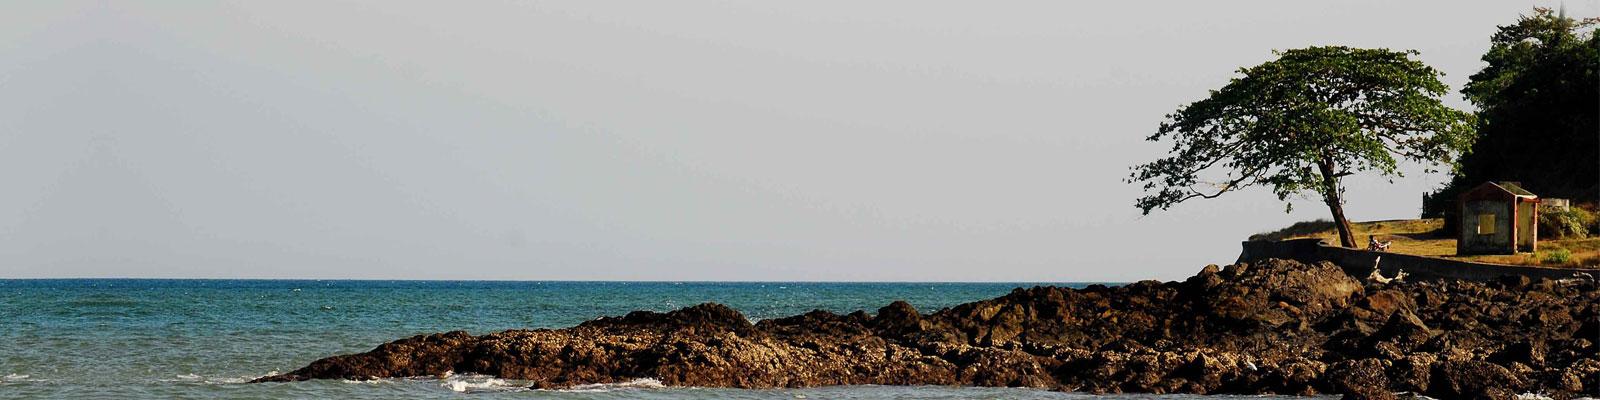 andman nikobar beach